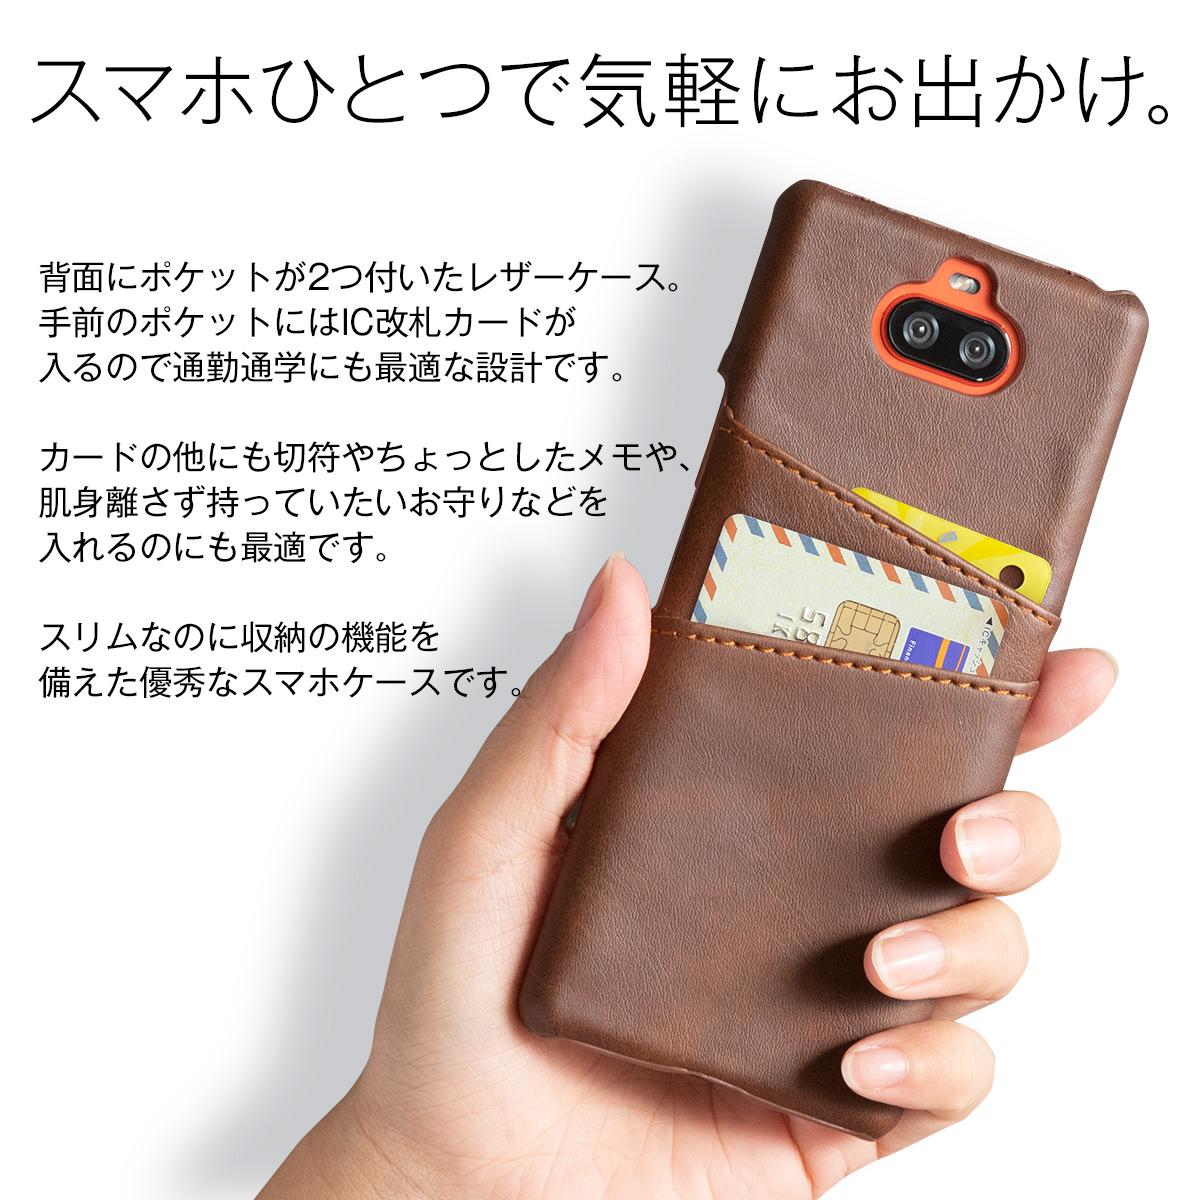 Xperia 8 SOV42 902SO カードポケット付き レザー ハードケース エクスペリア xperia sov42 902so au ワイモバイル